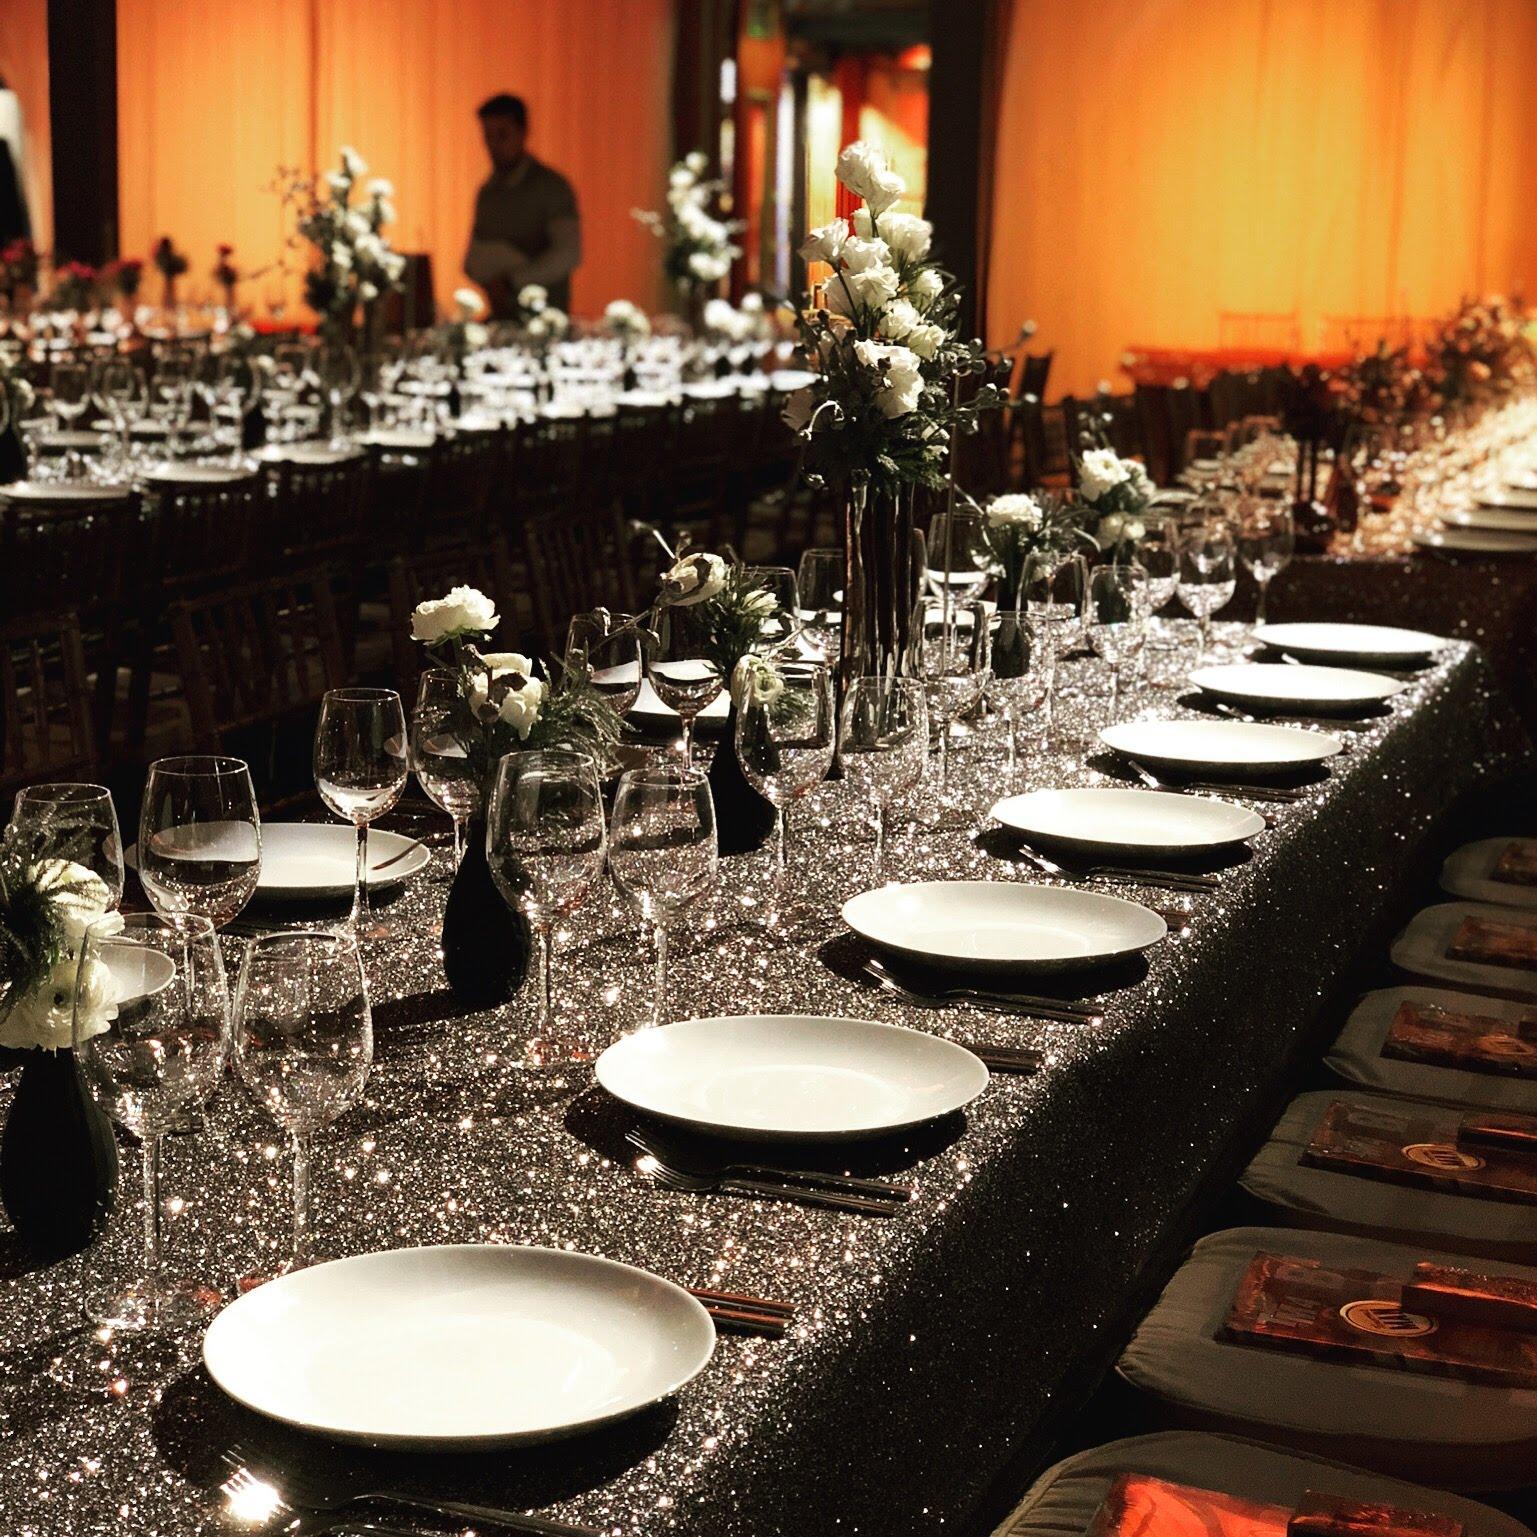 Event Tablecloth